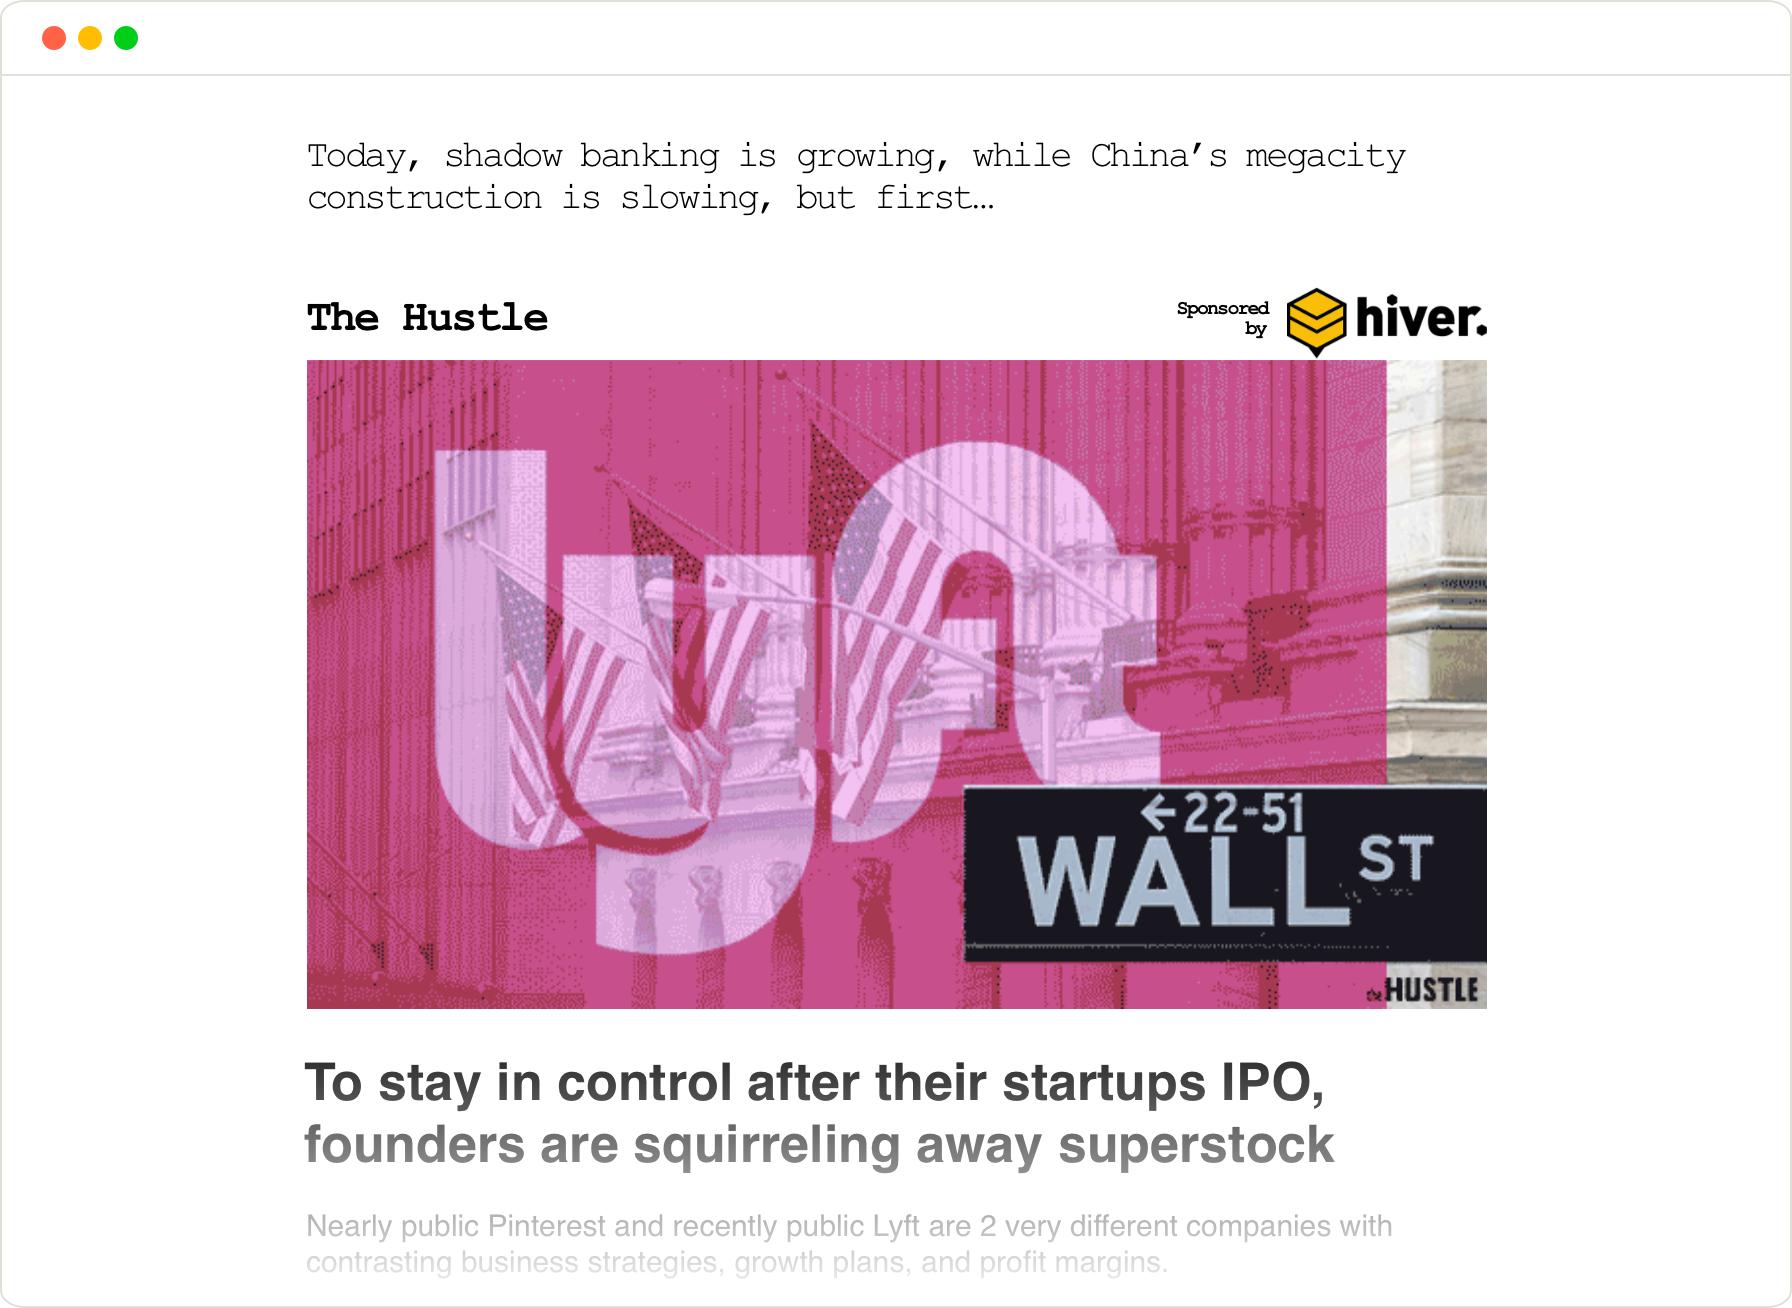 the Hustle headline